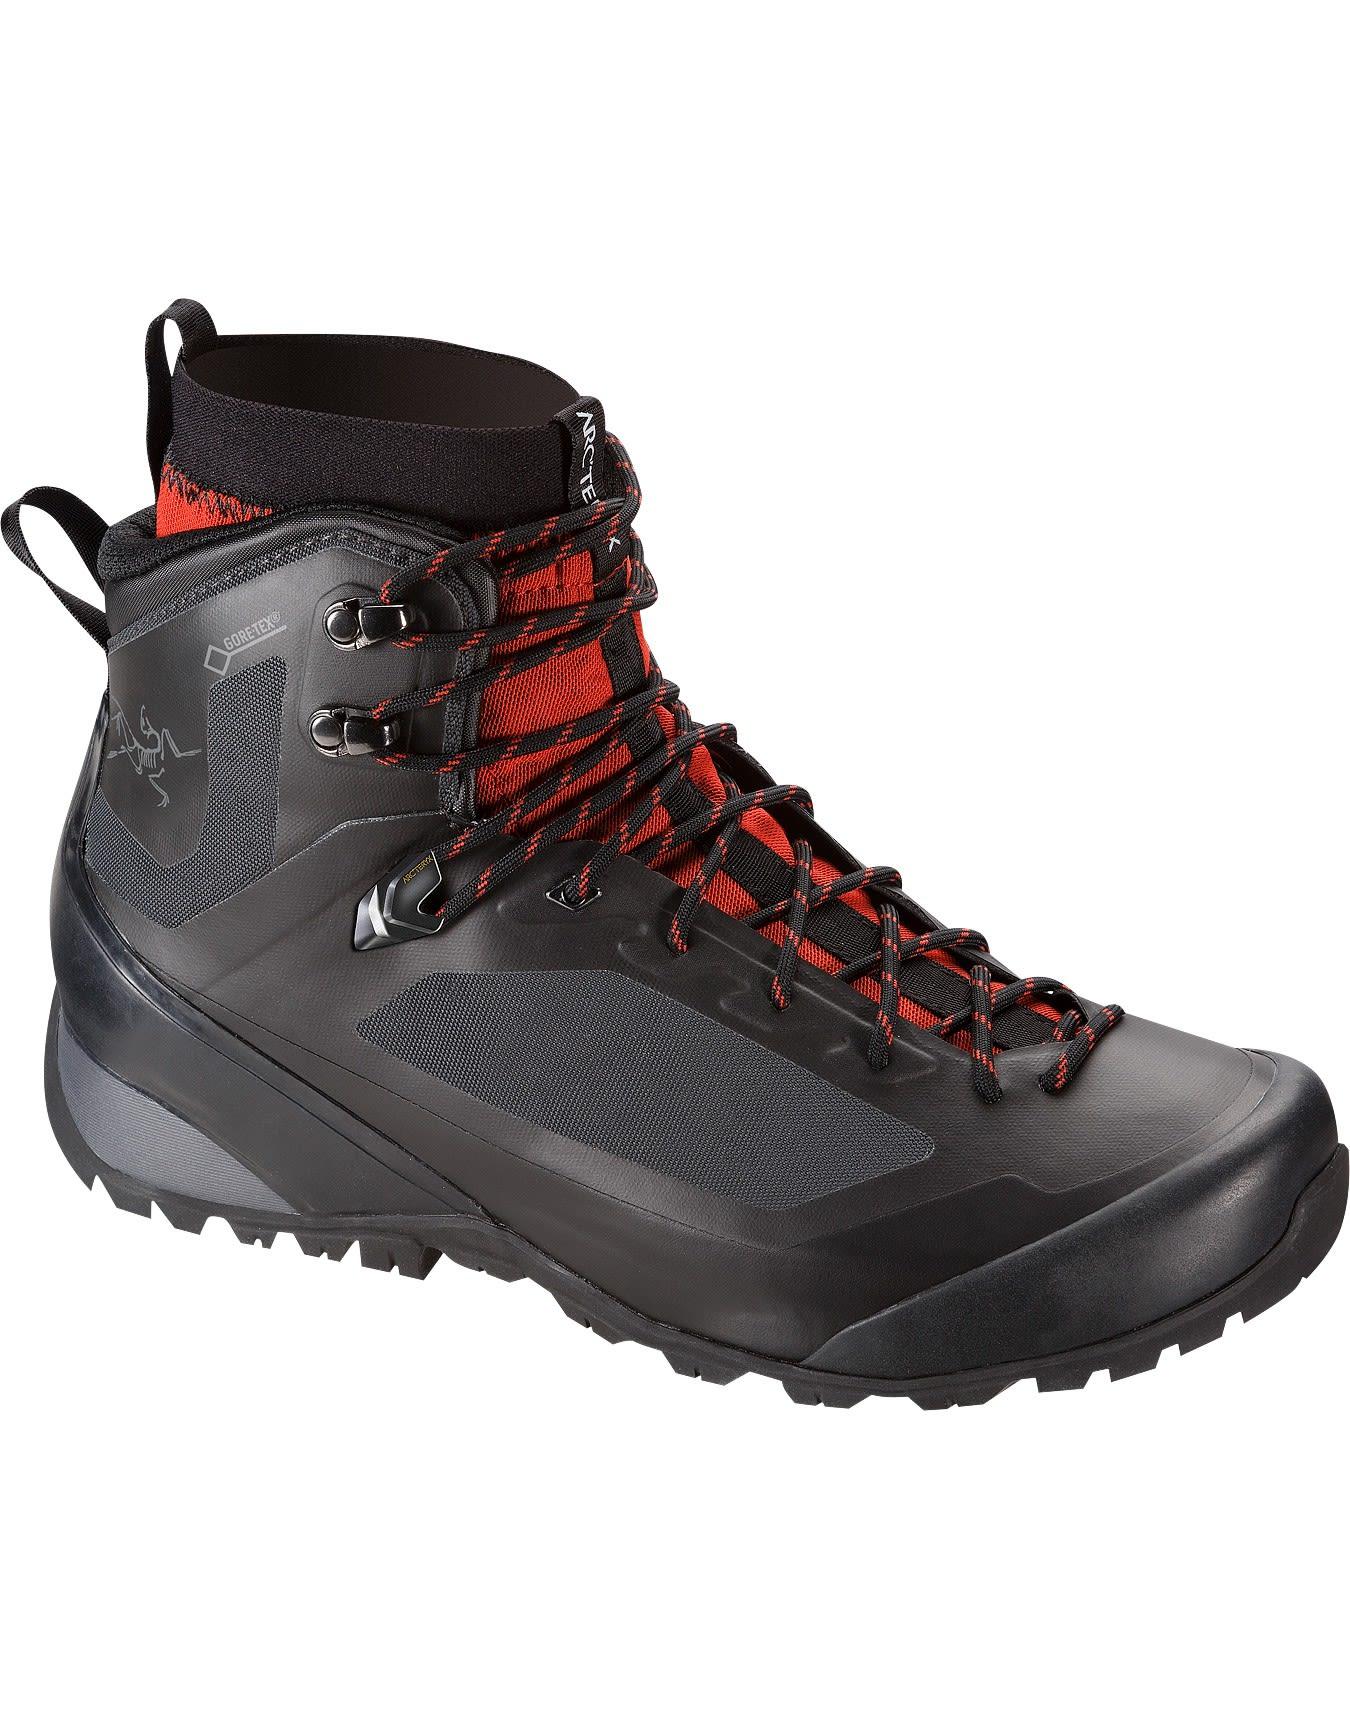 Arcteryx Bora2 Mid Gtx® Hiking Boot Schwarz, Male Gore-Tex® Hiking-& Approach-